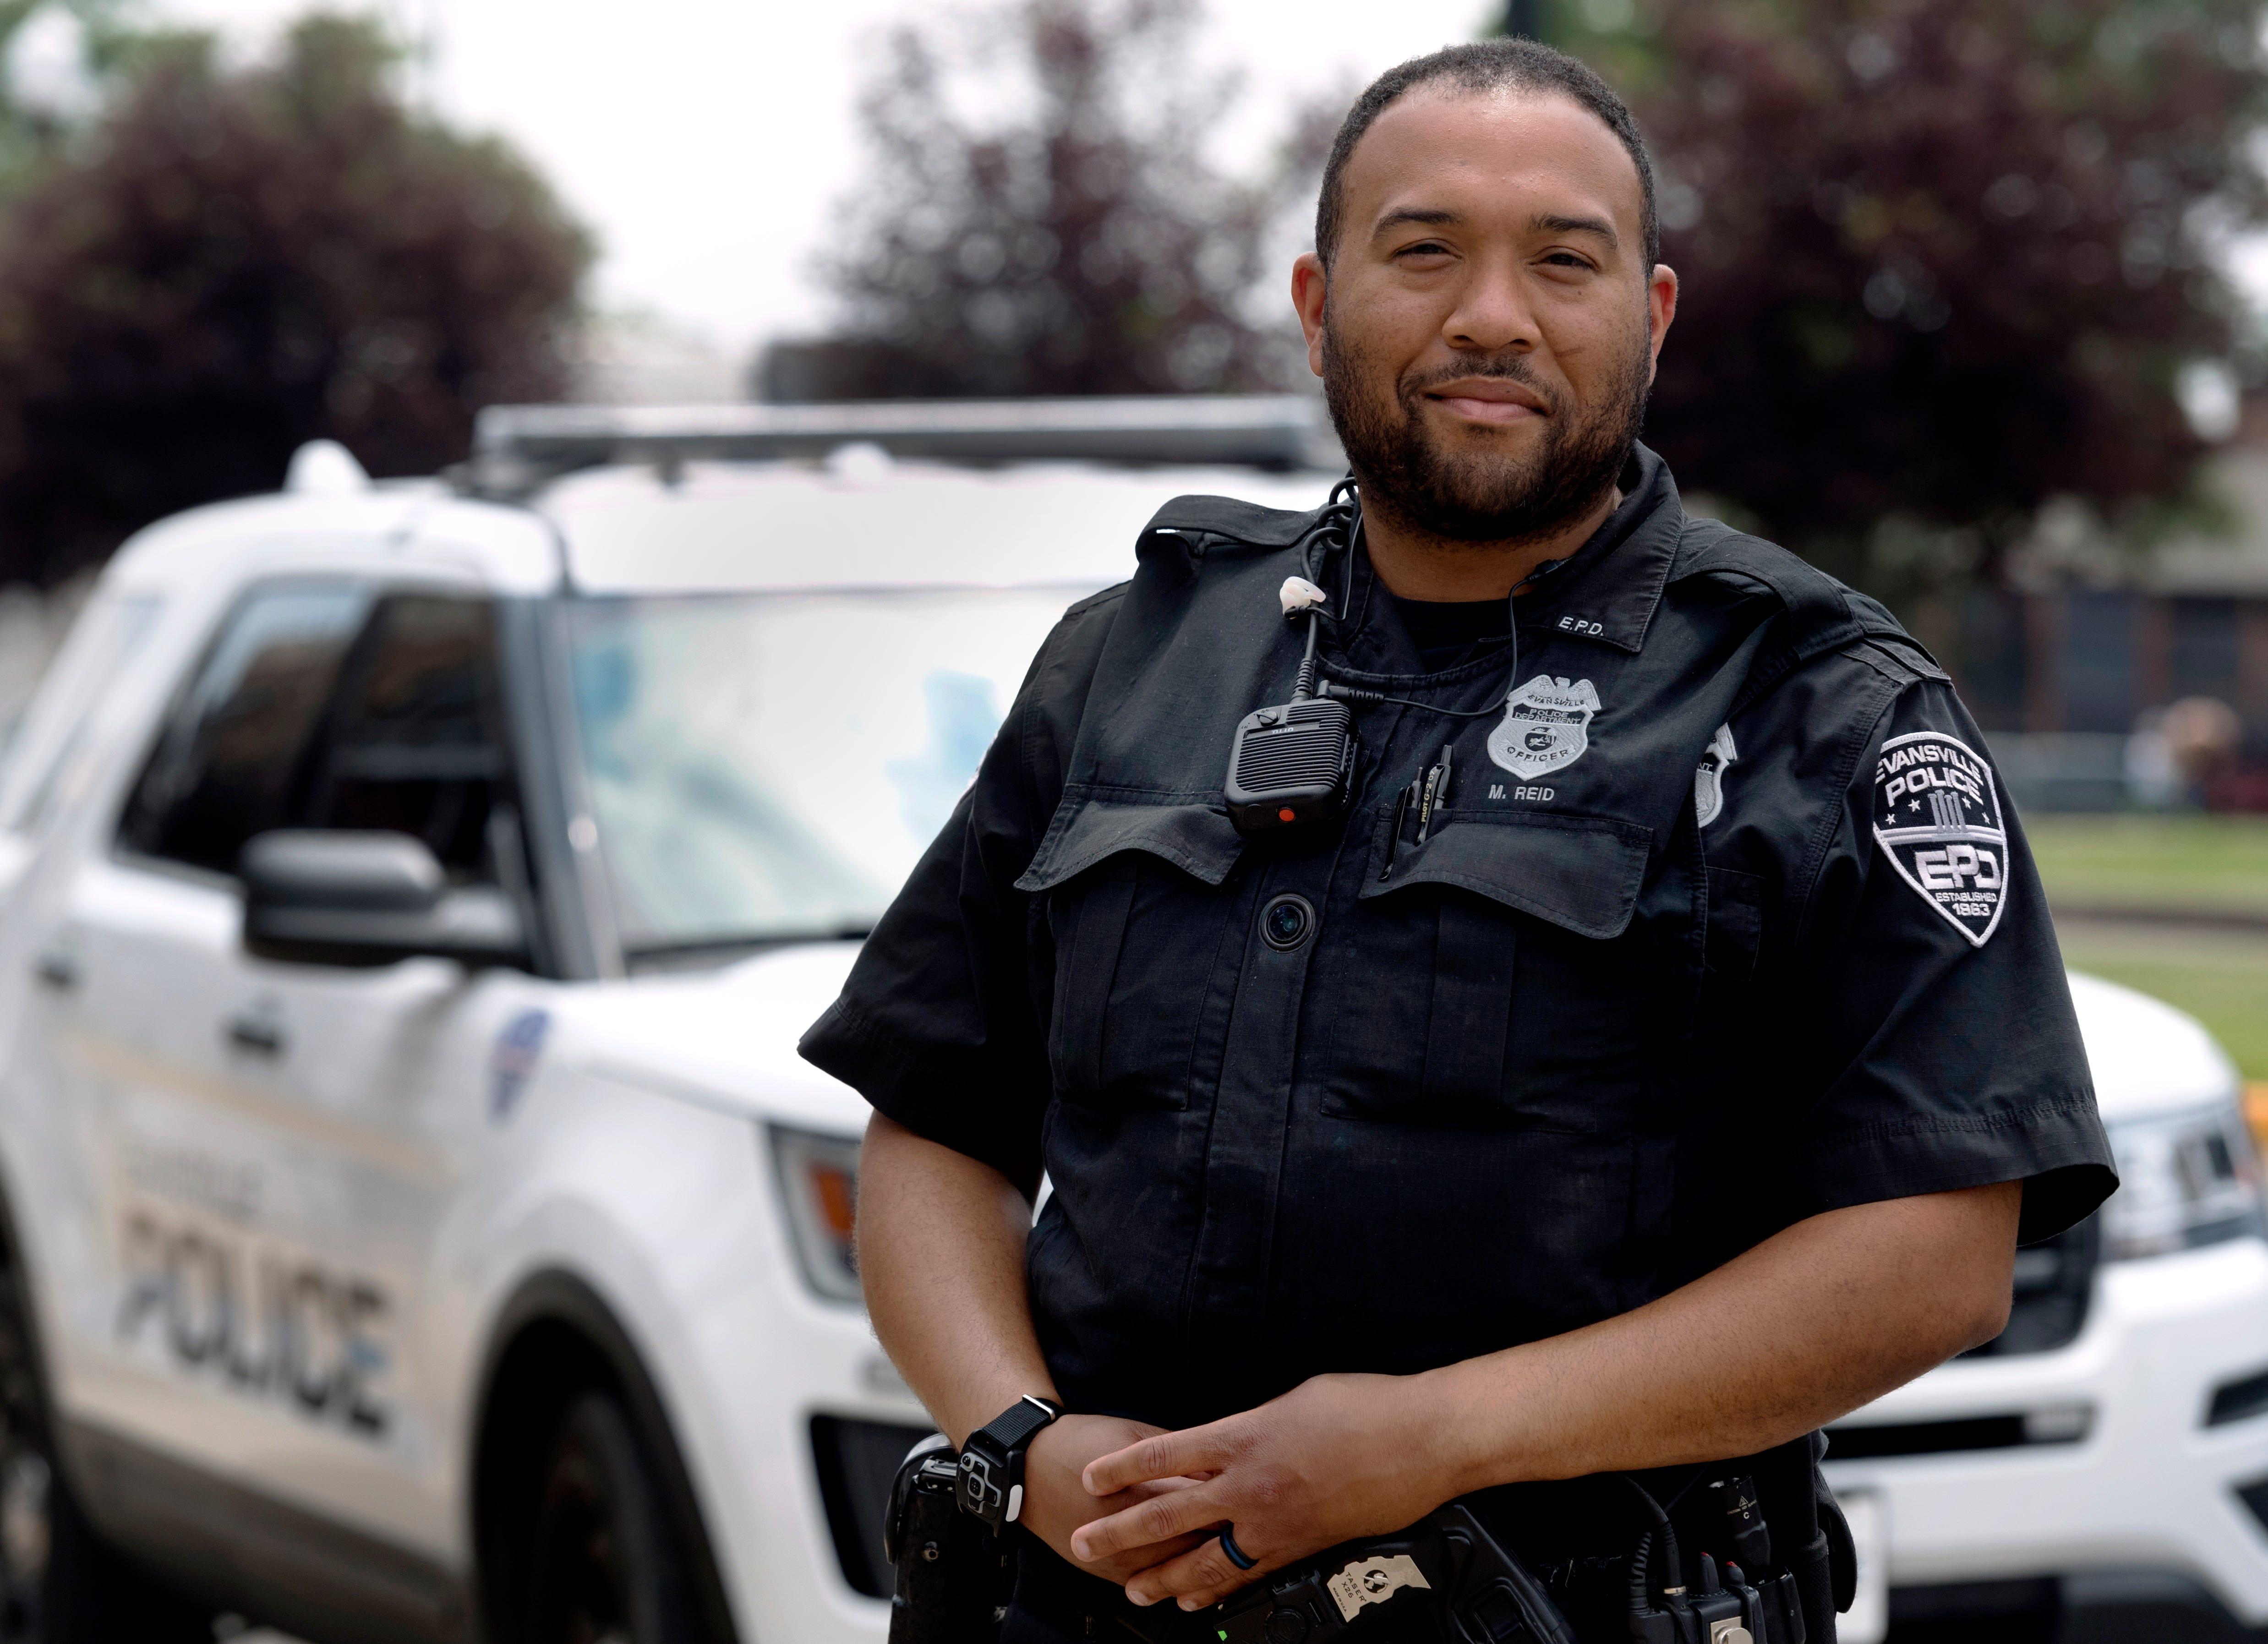 Evansville Police Department officer Mario Reid